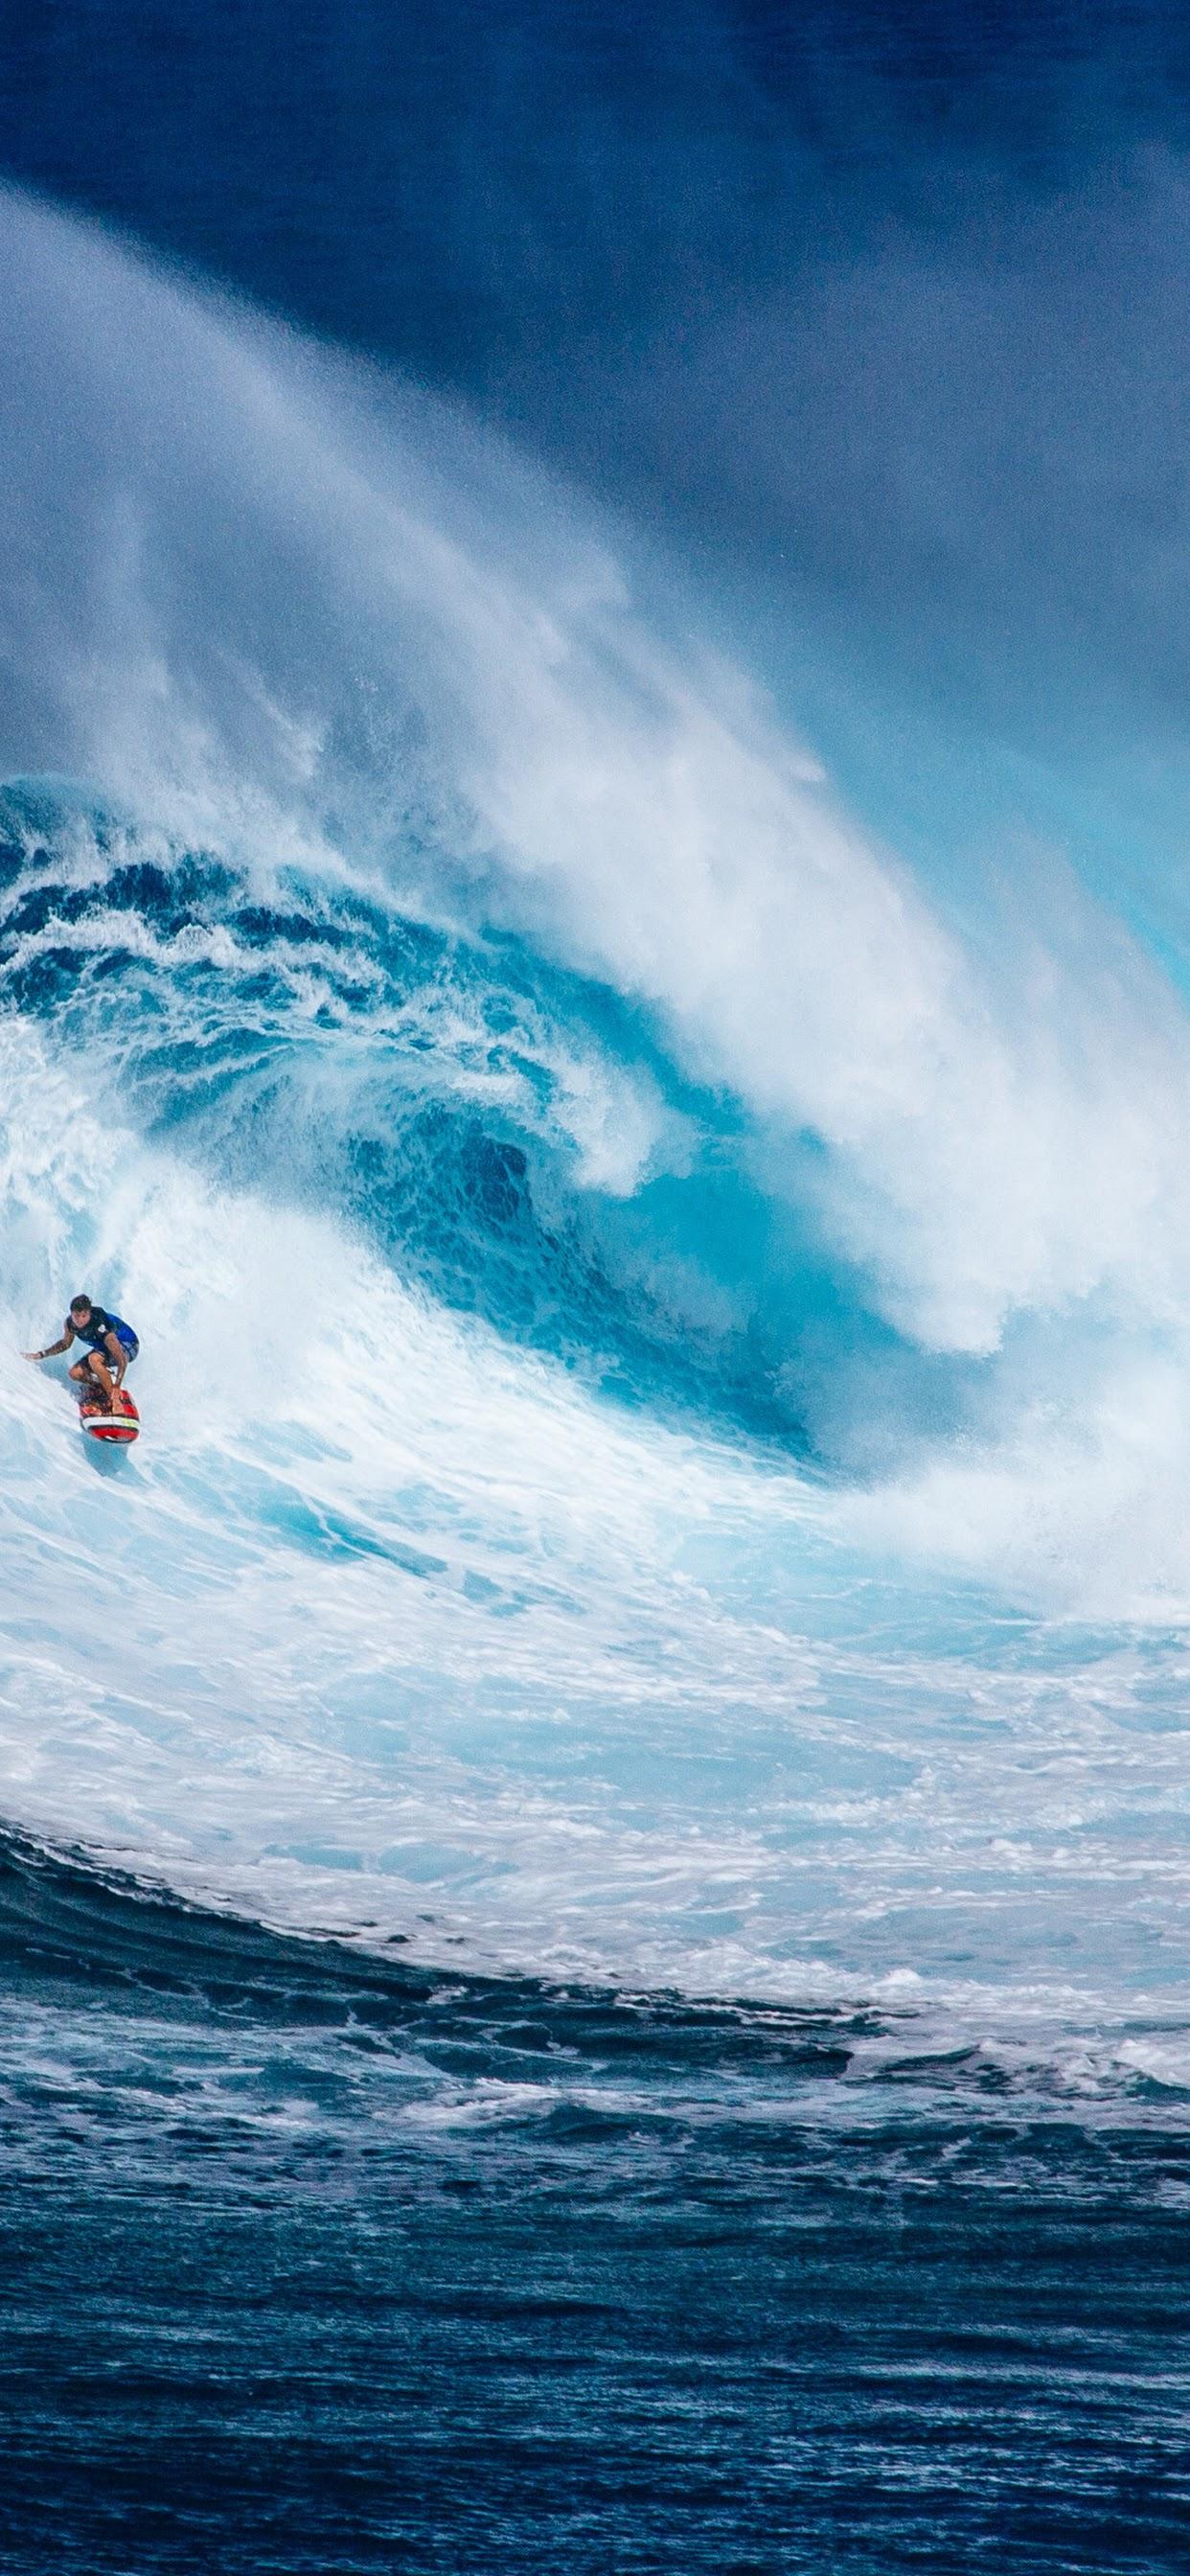 Surfing Ocean Waves Nature Scenery 4k Surfing Wallpaper Iphone 11 1242x2688 Wallpaper Teahub Io